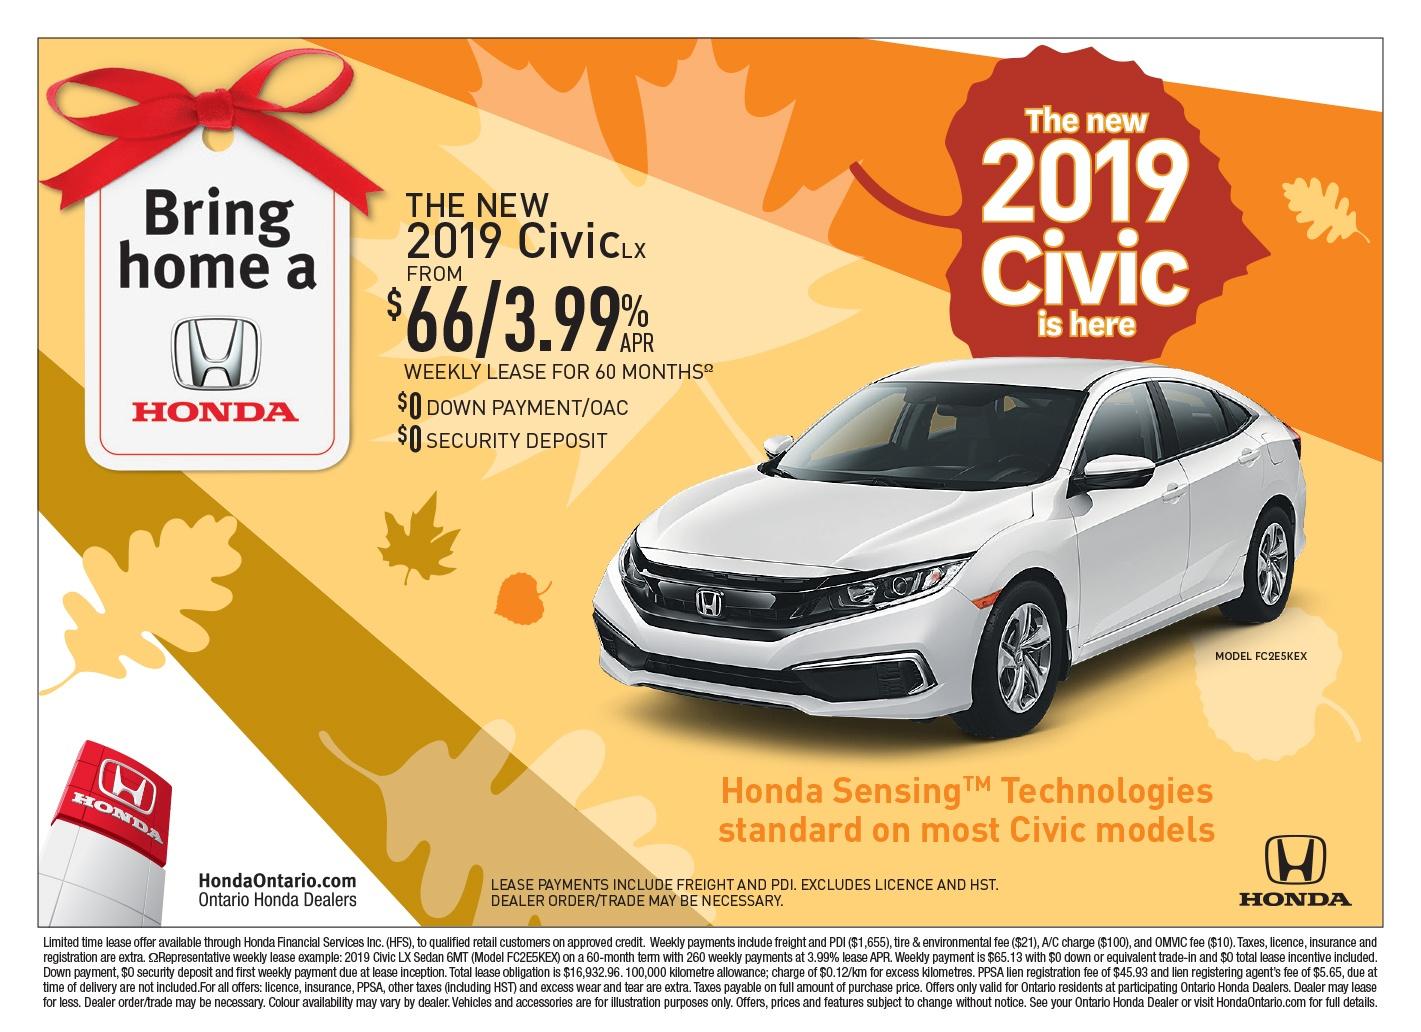 The New 2019 Honda Civic LX | Bring Home a Honda Event